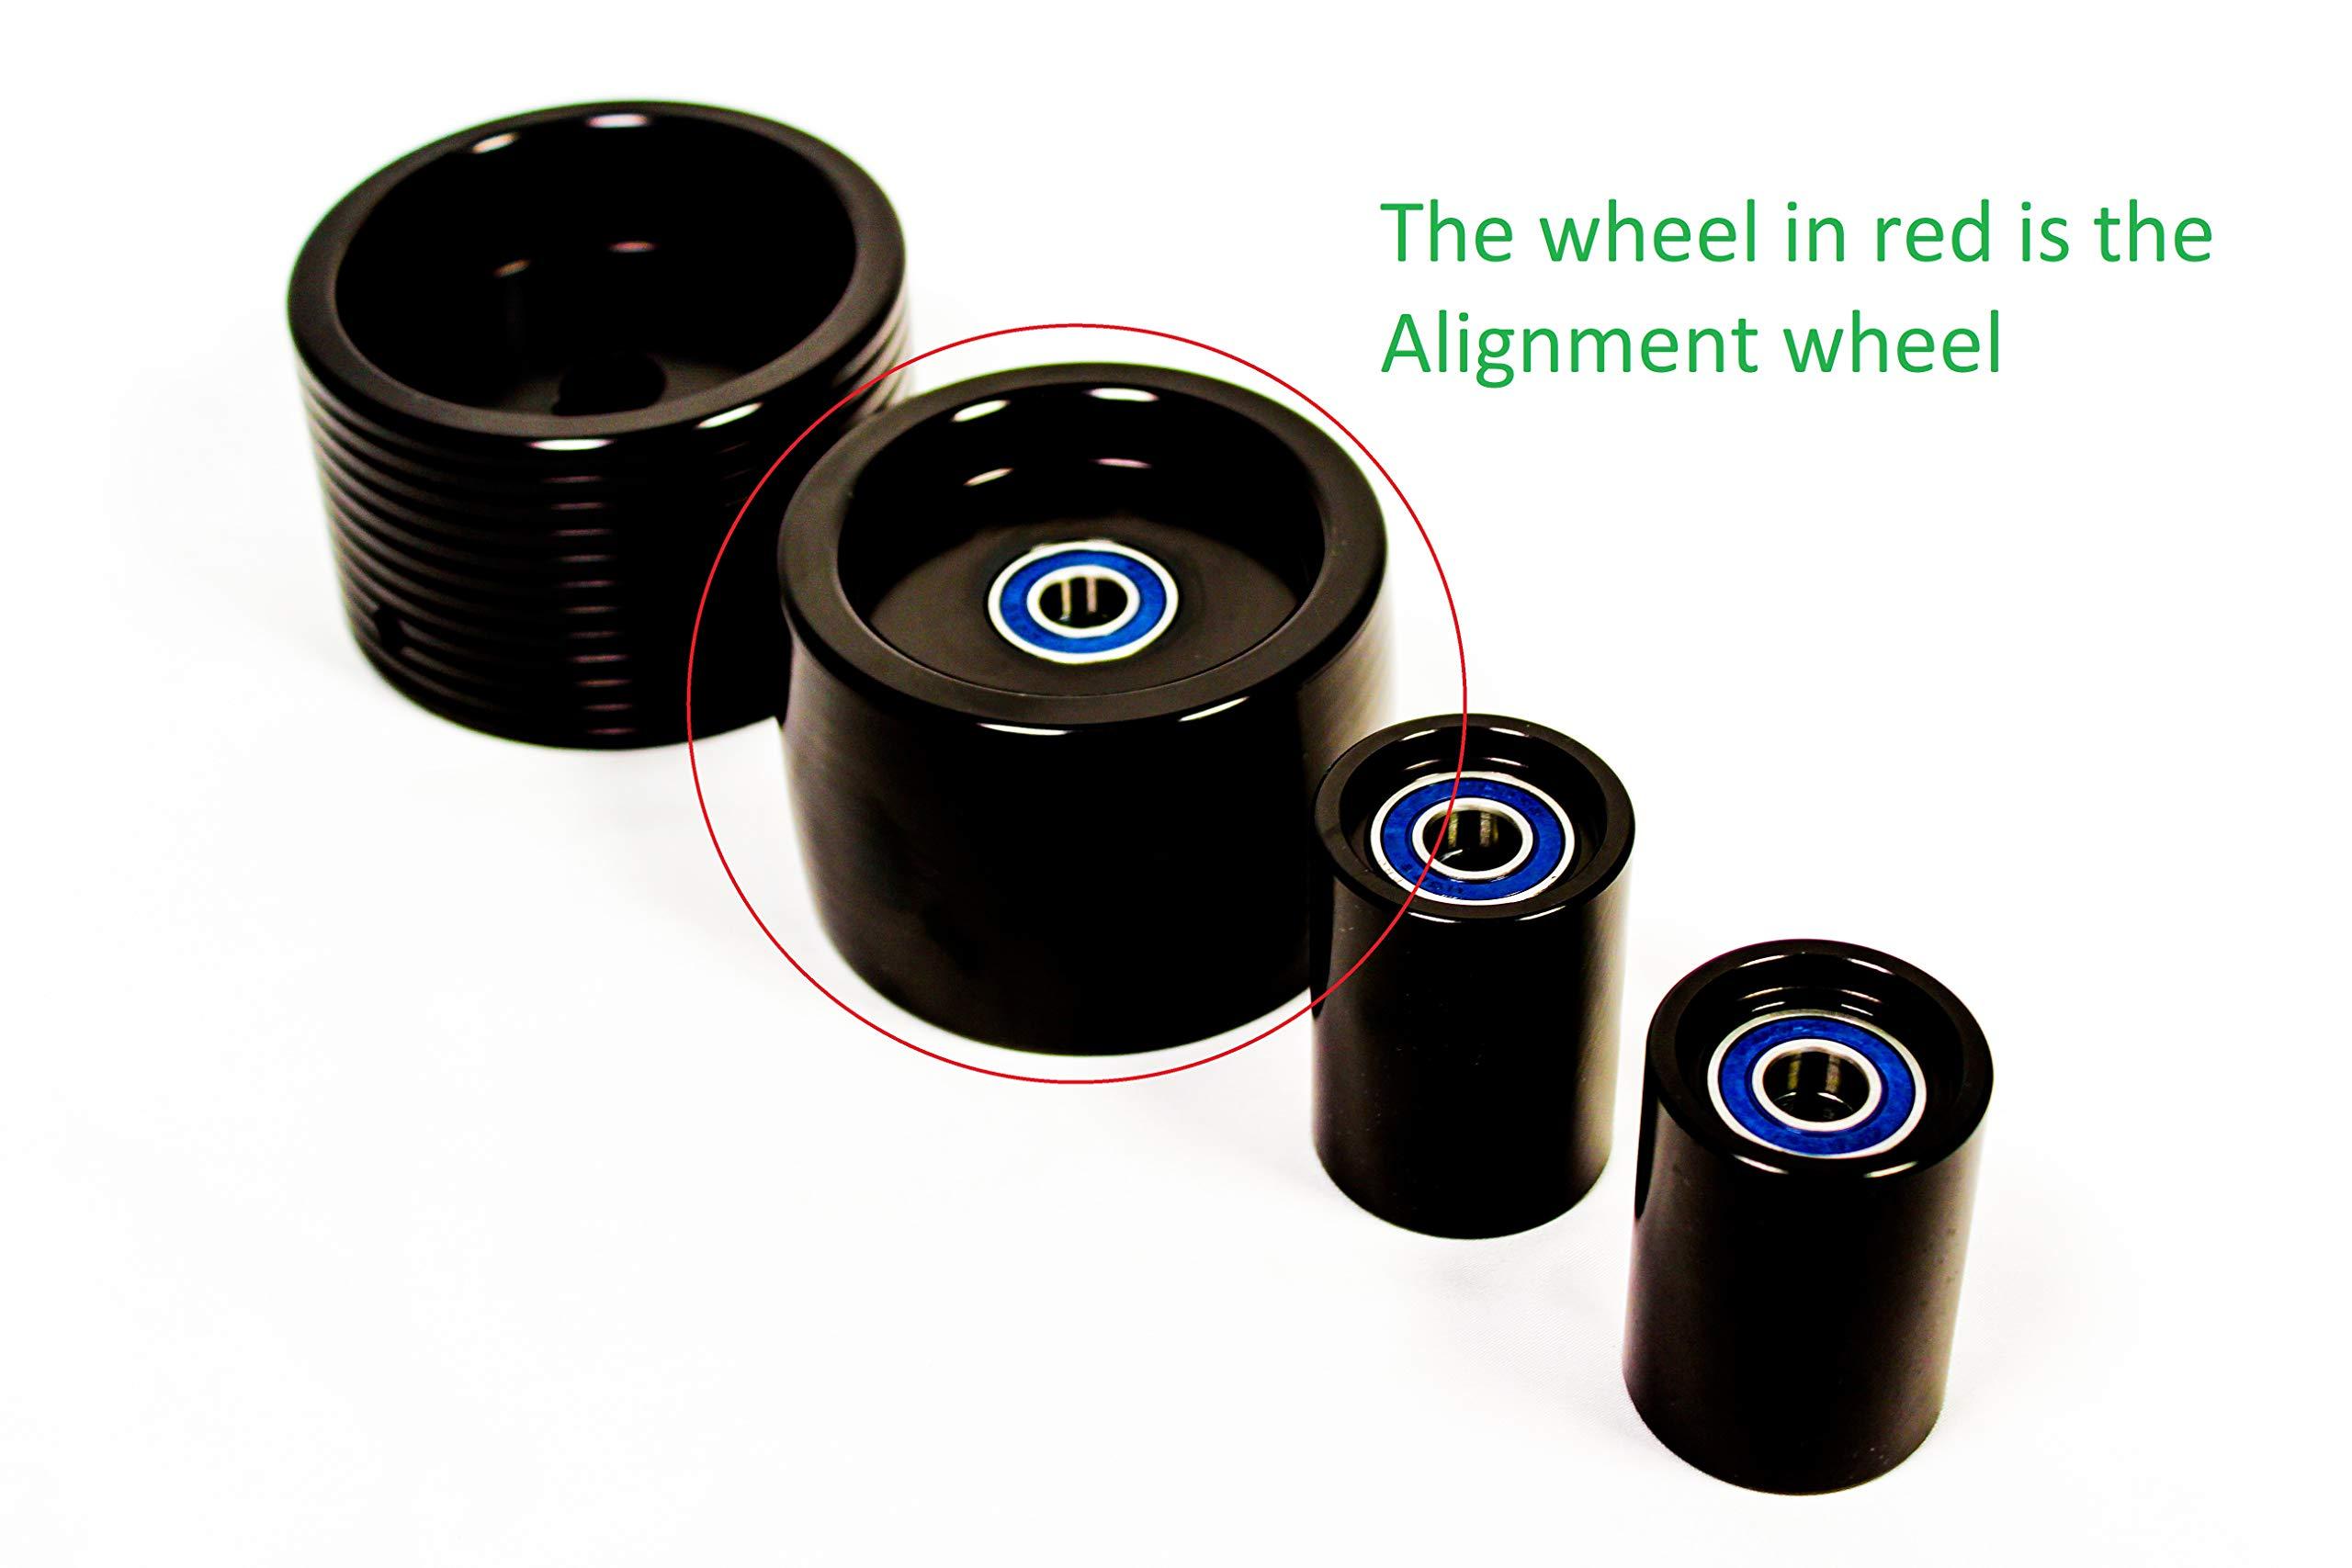 Belt Grinder Alignment Wheel WEAR RESISTANT WHEEL MADE IN USA by The Belt Grinder